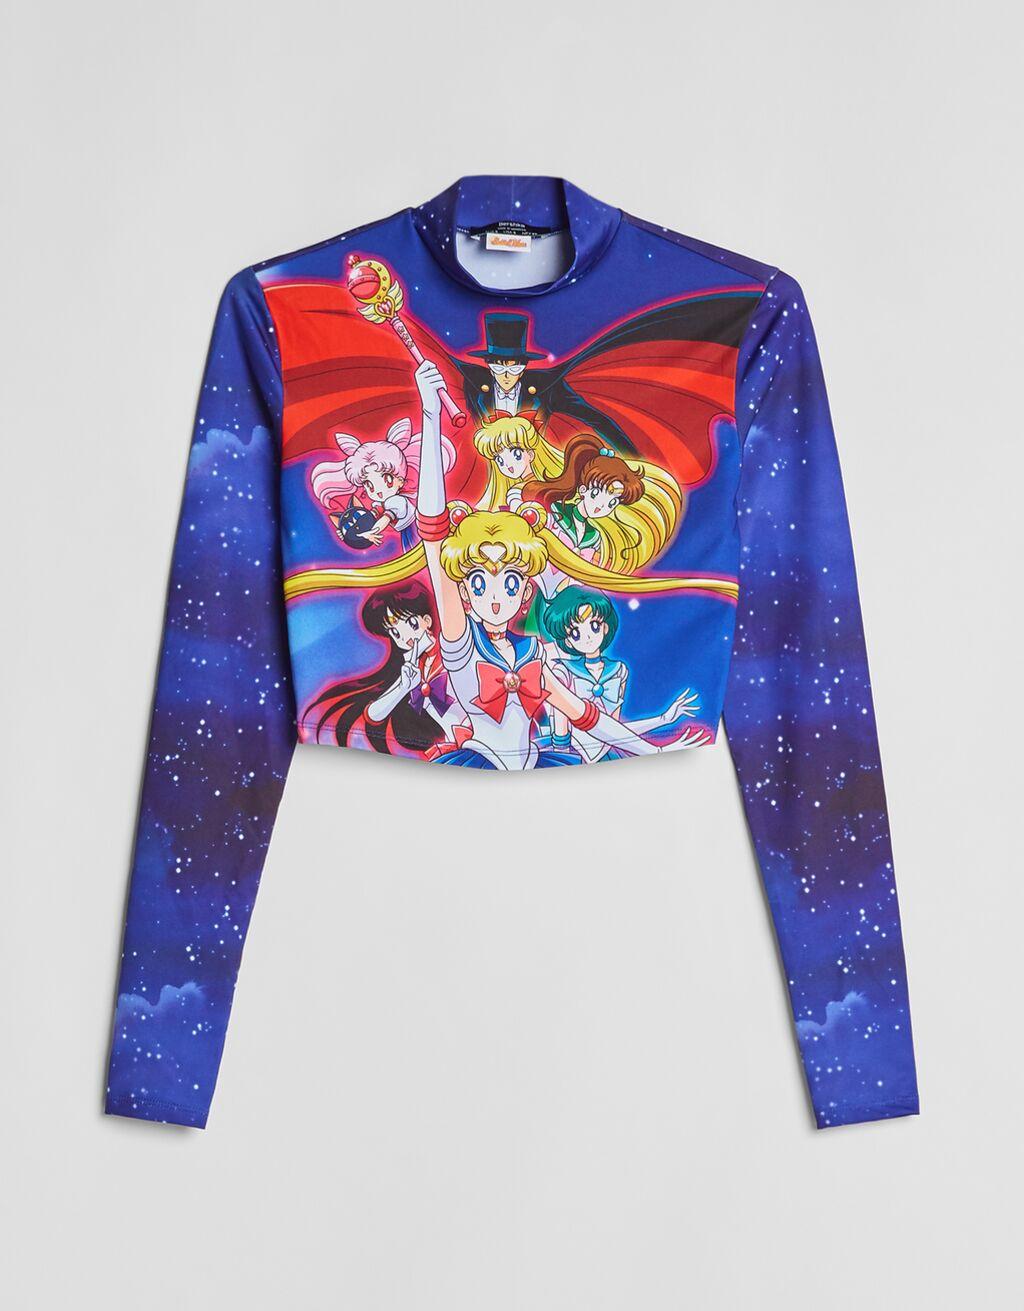 Camiseta manga larga Sailor Moon.